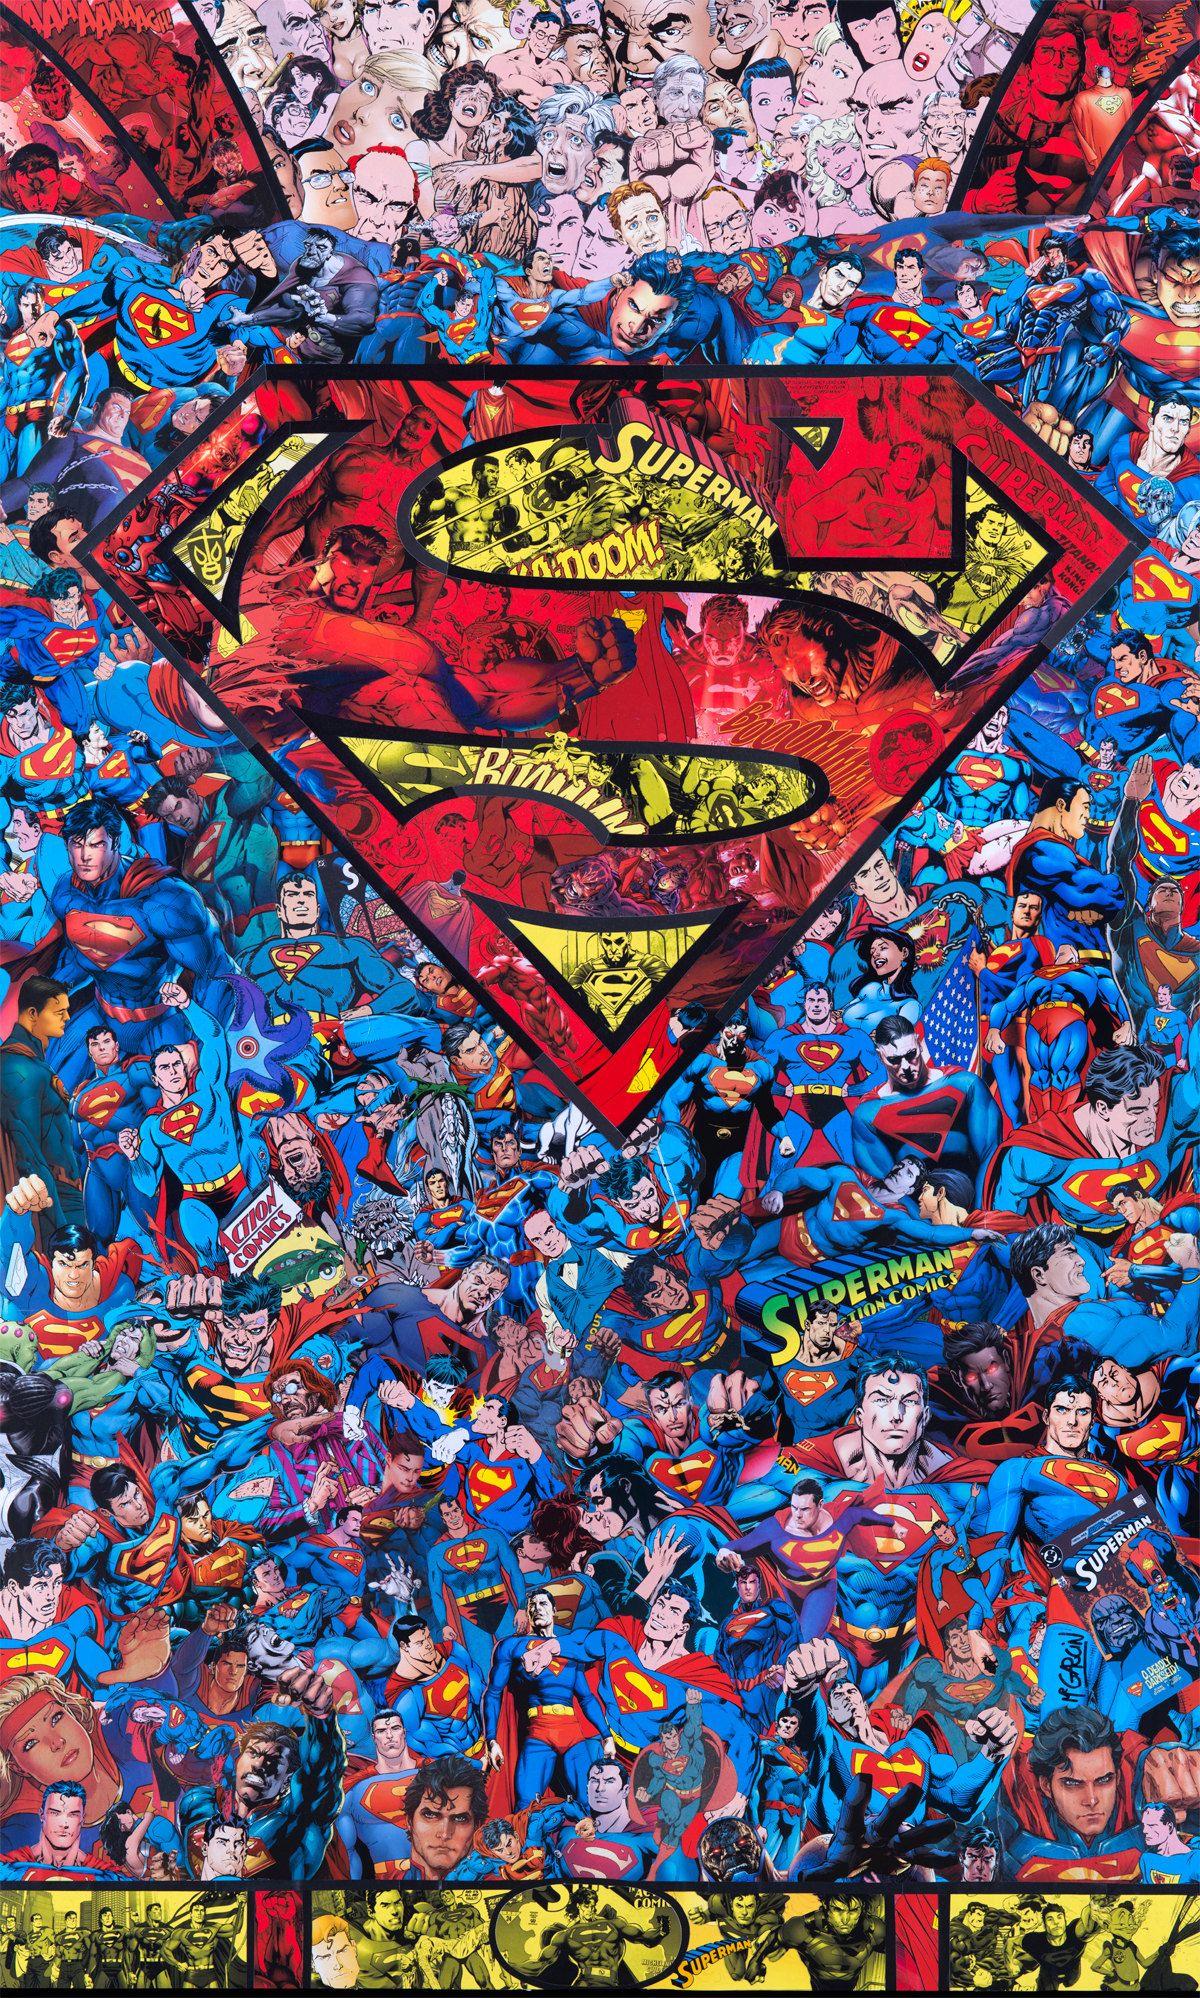 Geek Art M Garcin Flash And Superman CollagesOn Continue Sur La Lancee Des